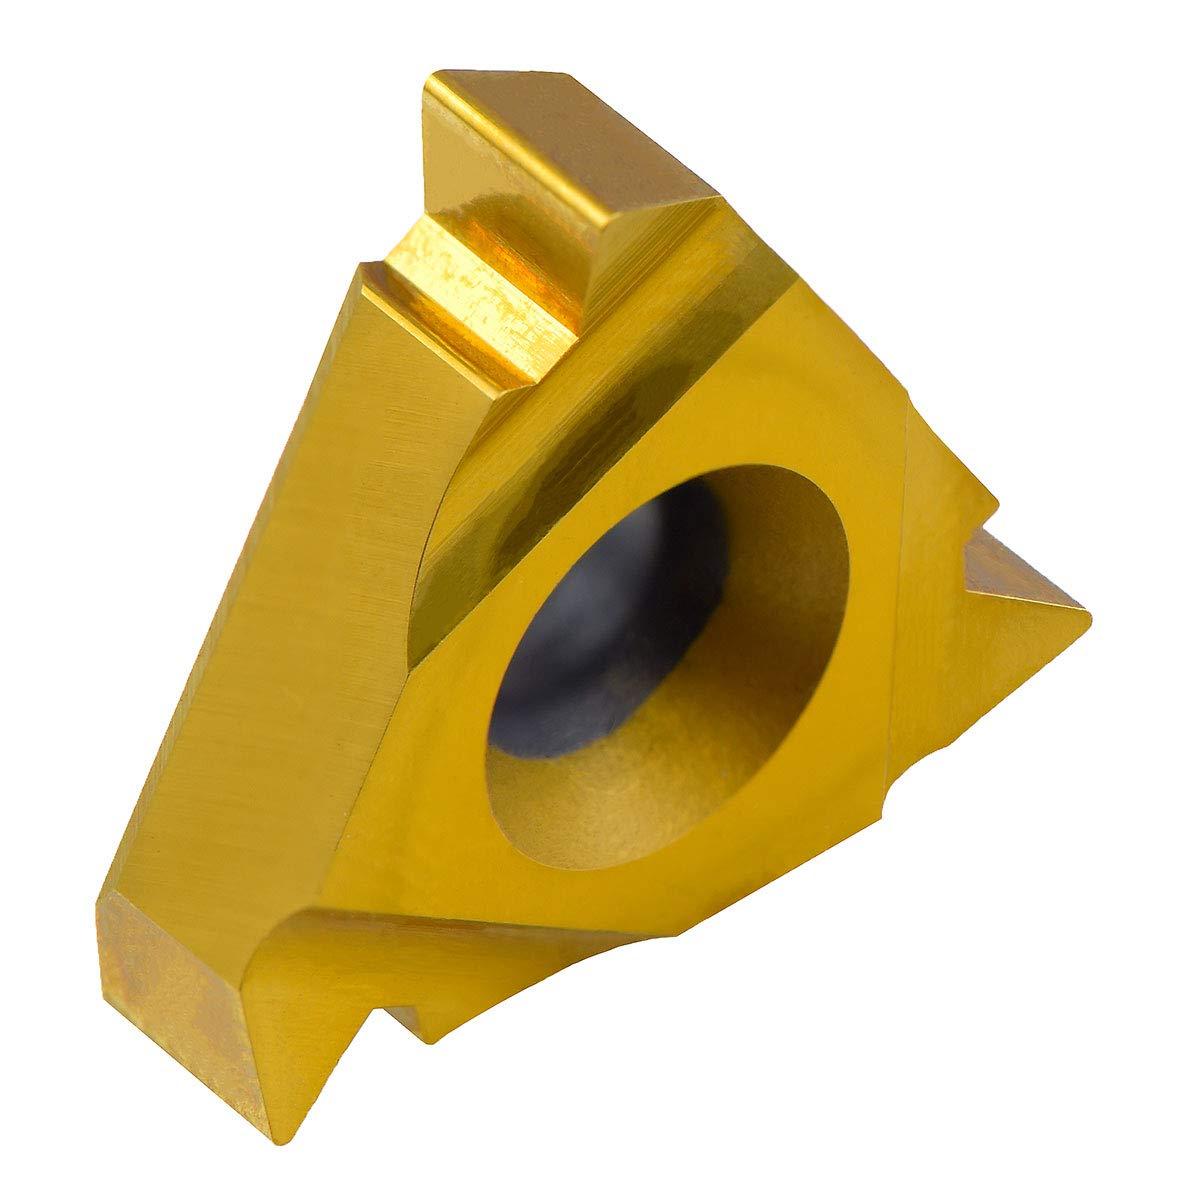 12 TPI Carbide TIAIN-Coated ; 16NR12UN-T10 MAXTOOL 10PCs 16NR12UN Internal American UN Full Profile Indexable Threading Inserts 3//8 I.C